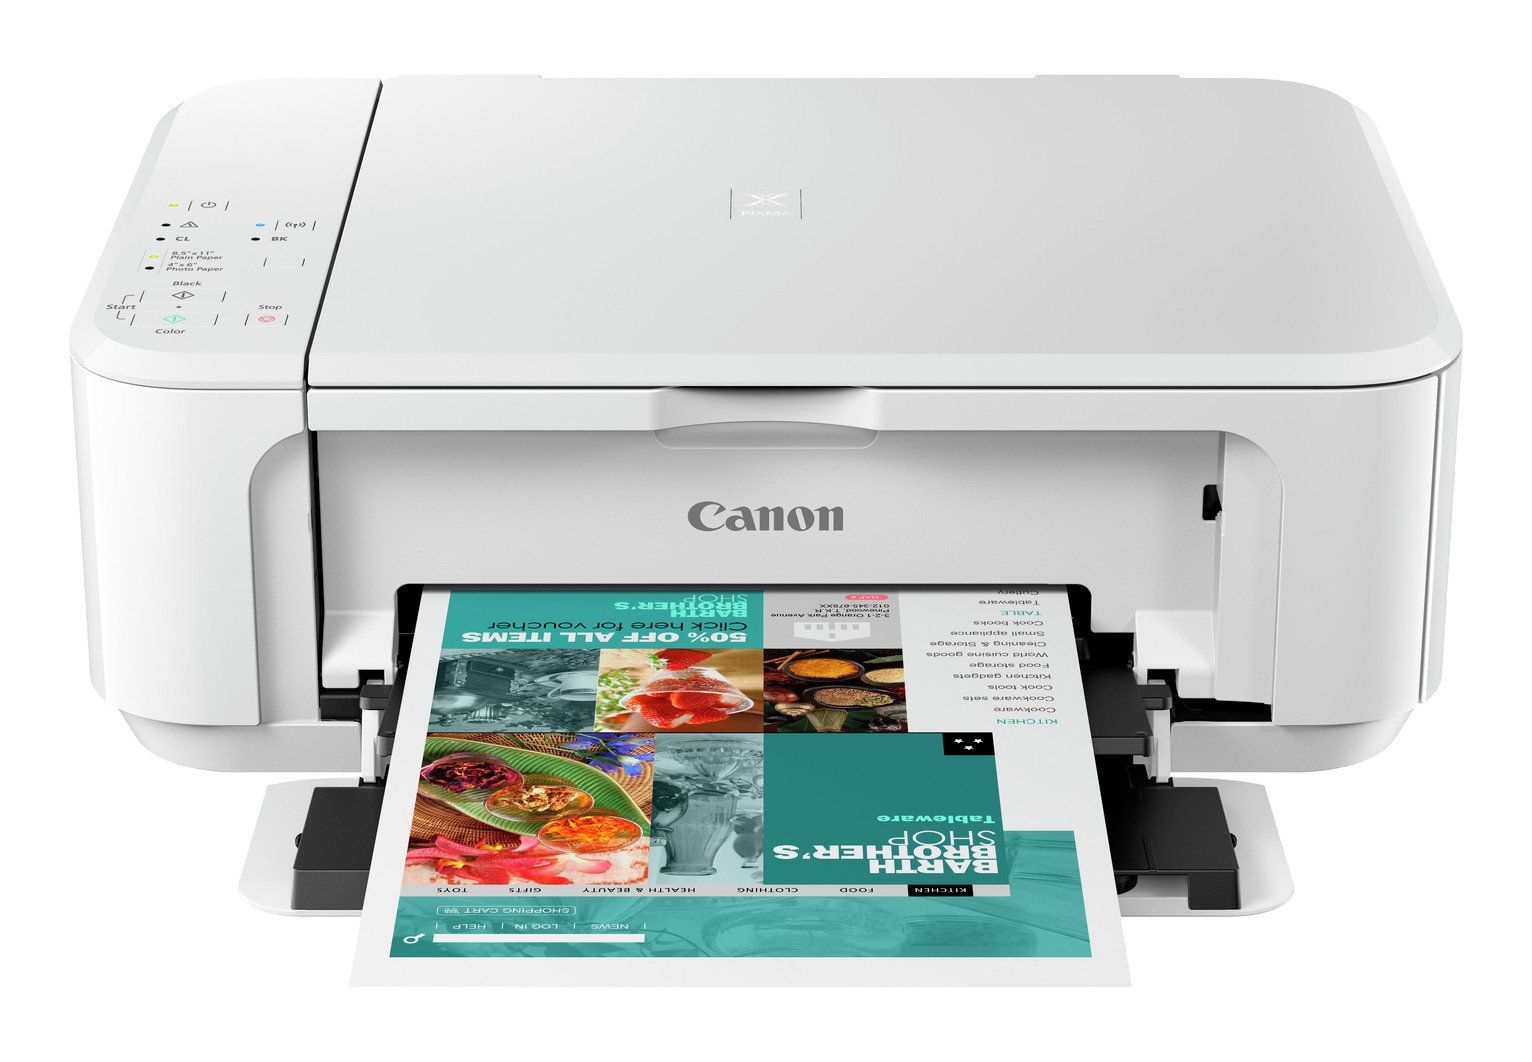 Canon PIXMA MG3650S Wireless Inkjet Printer